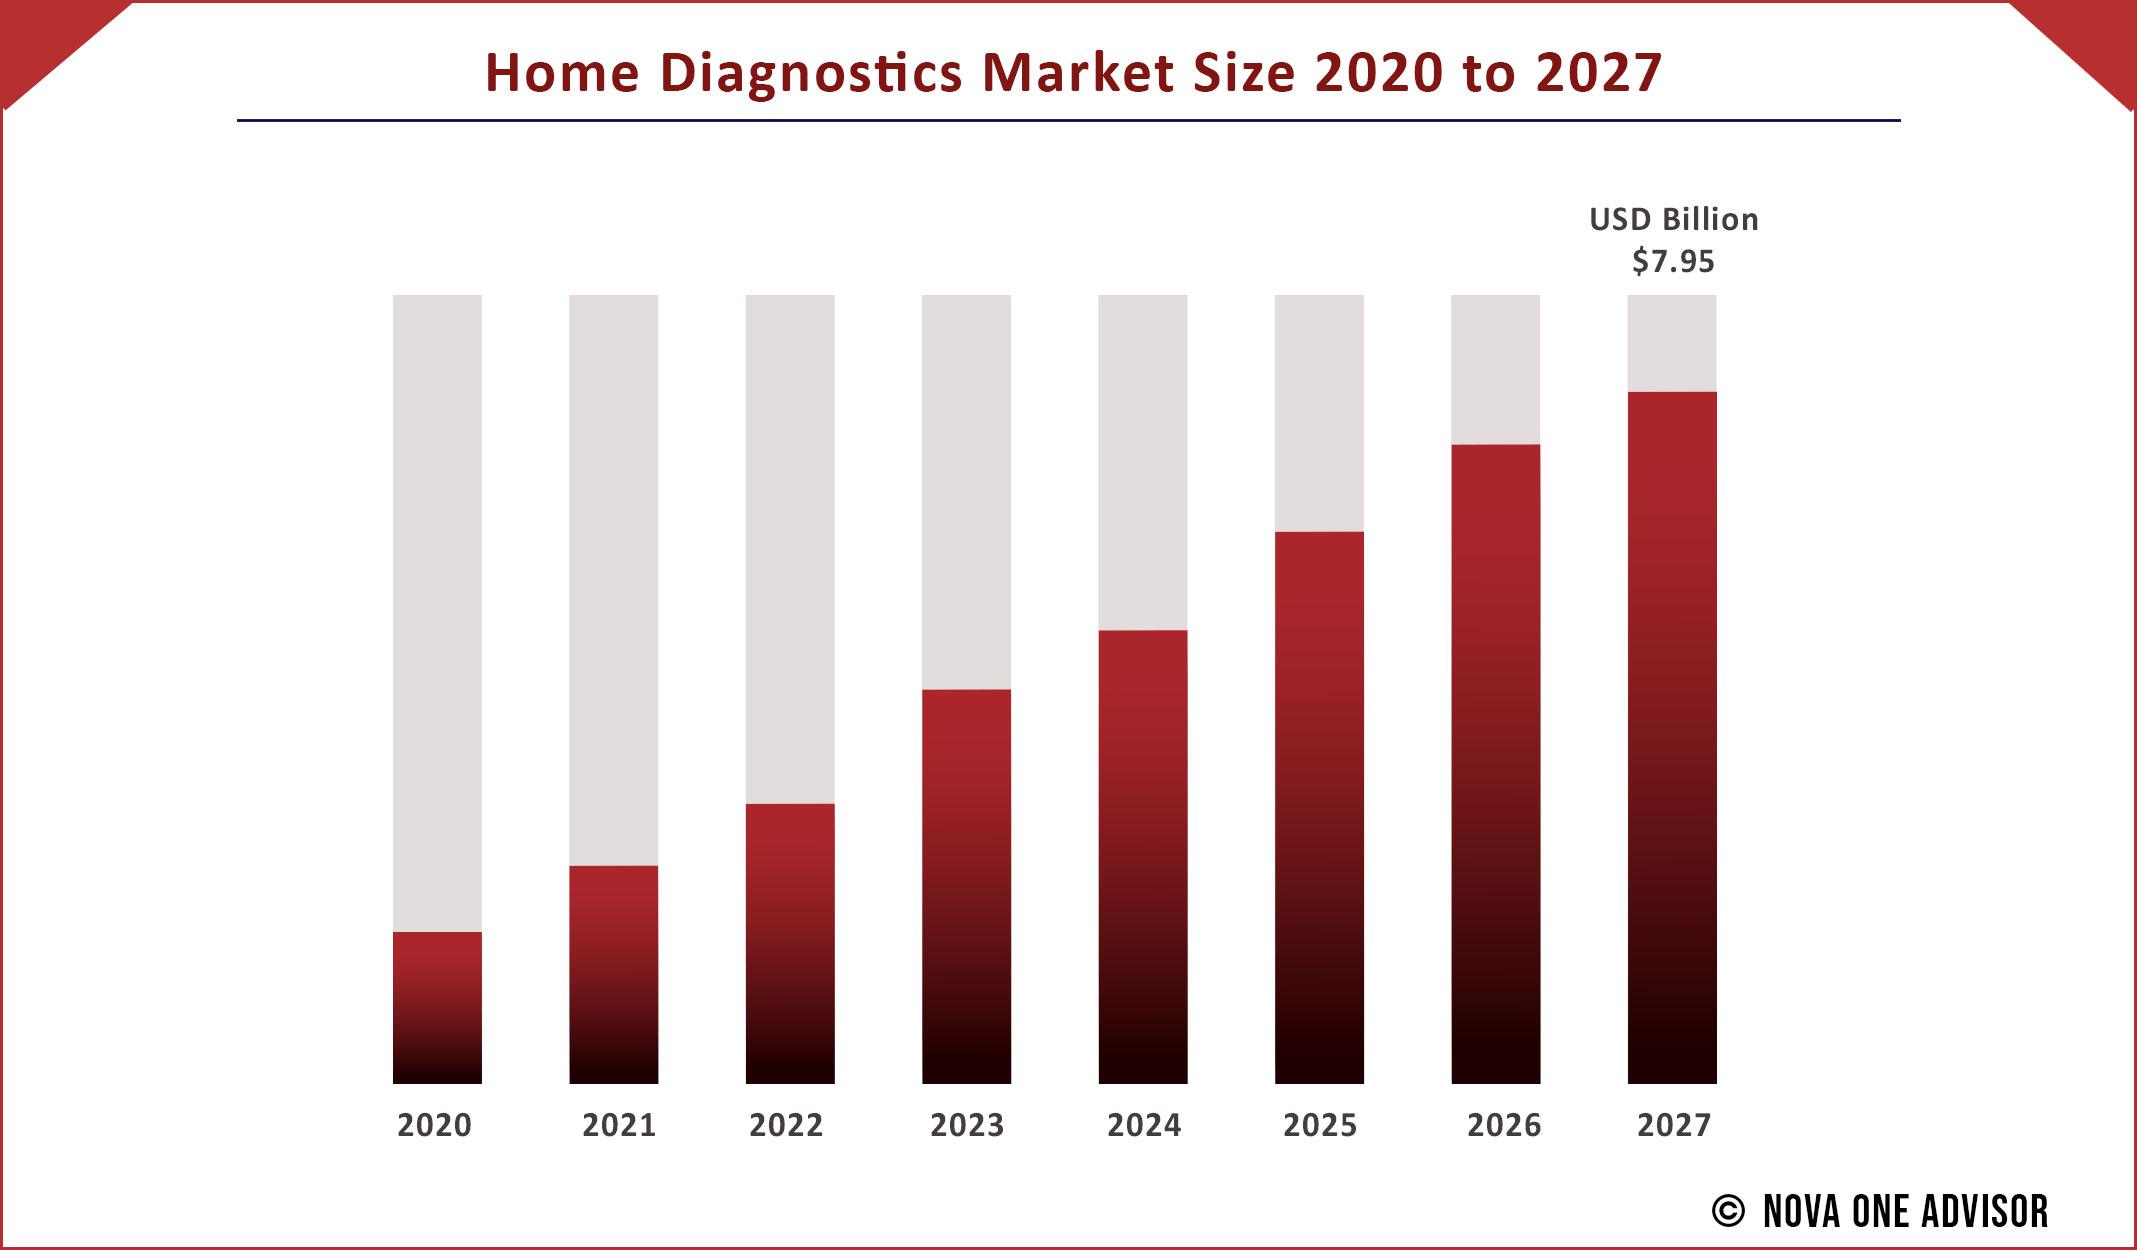 Home Diagnostics Market Size 2020 to 2027